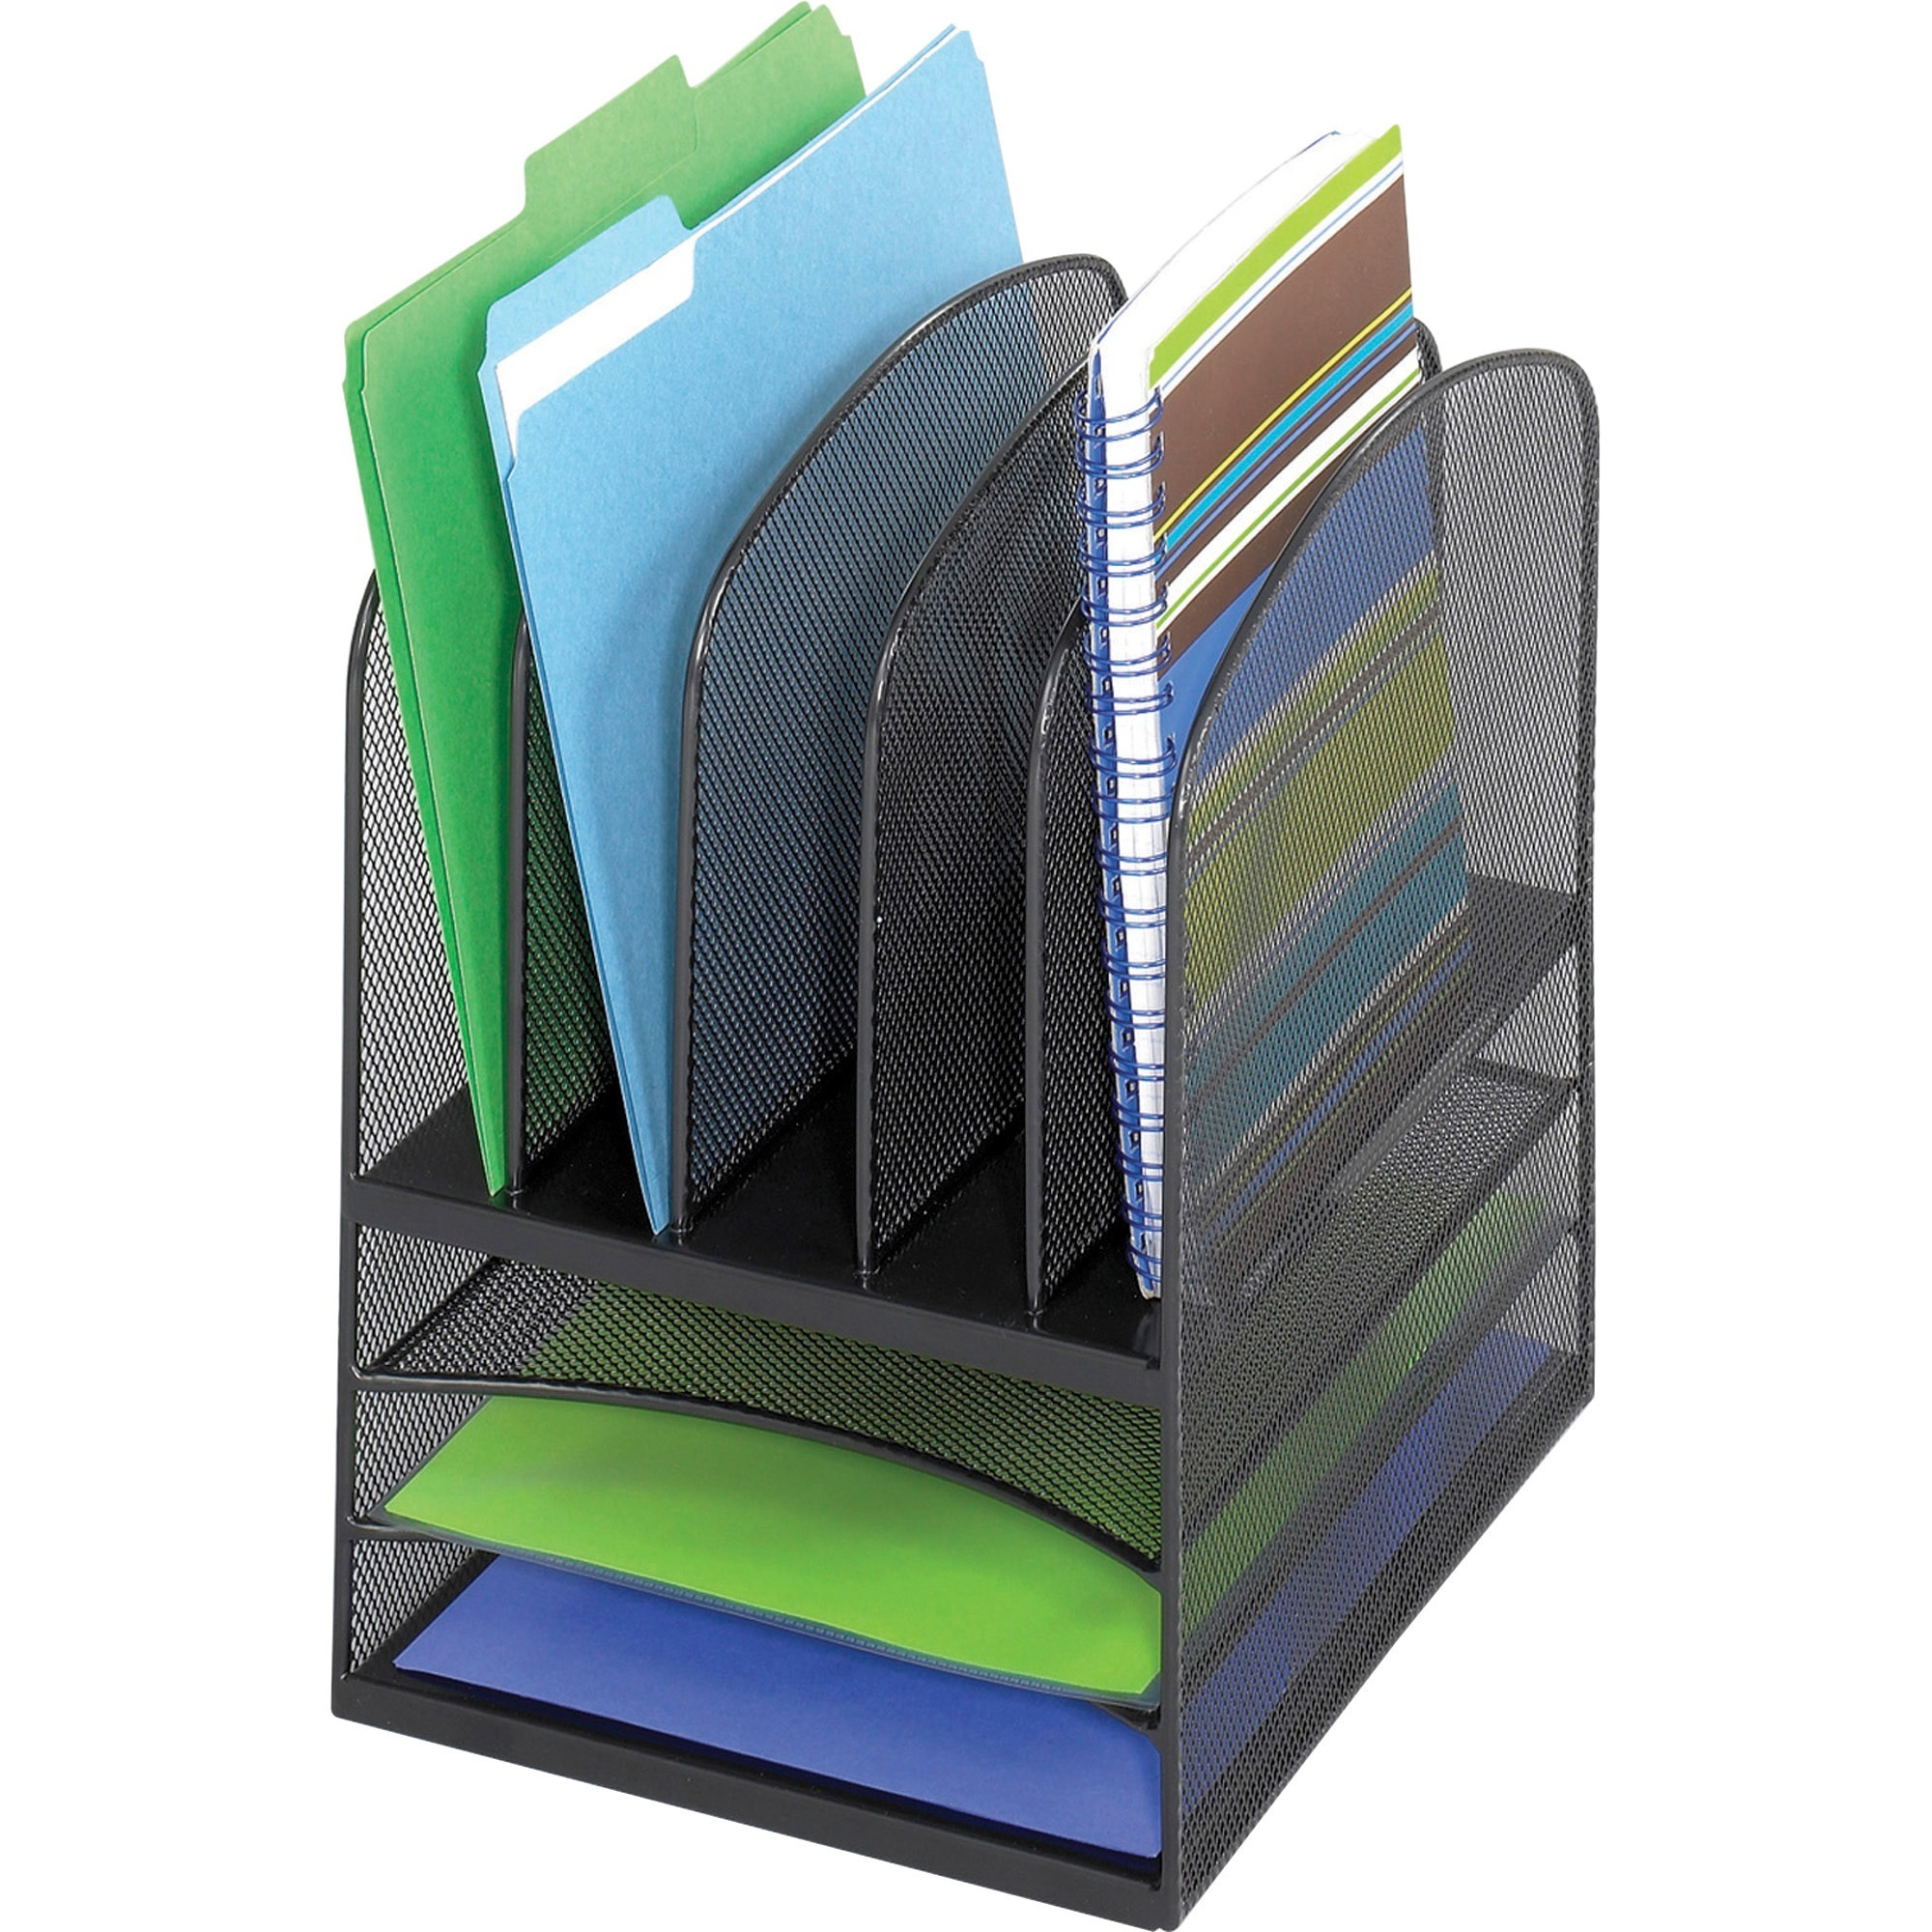 Safco, SAF3266BL, Onyx Mesh Letter Tray Desktop Organizer, 1 Each, Black